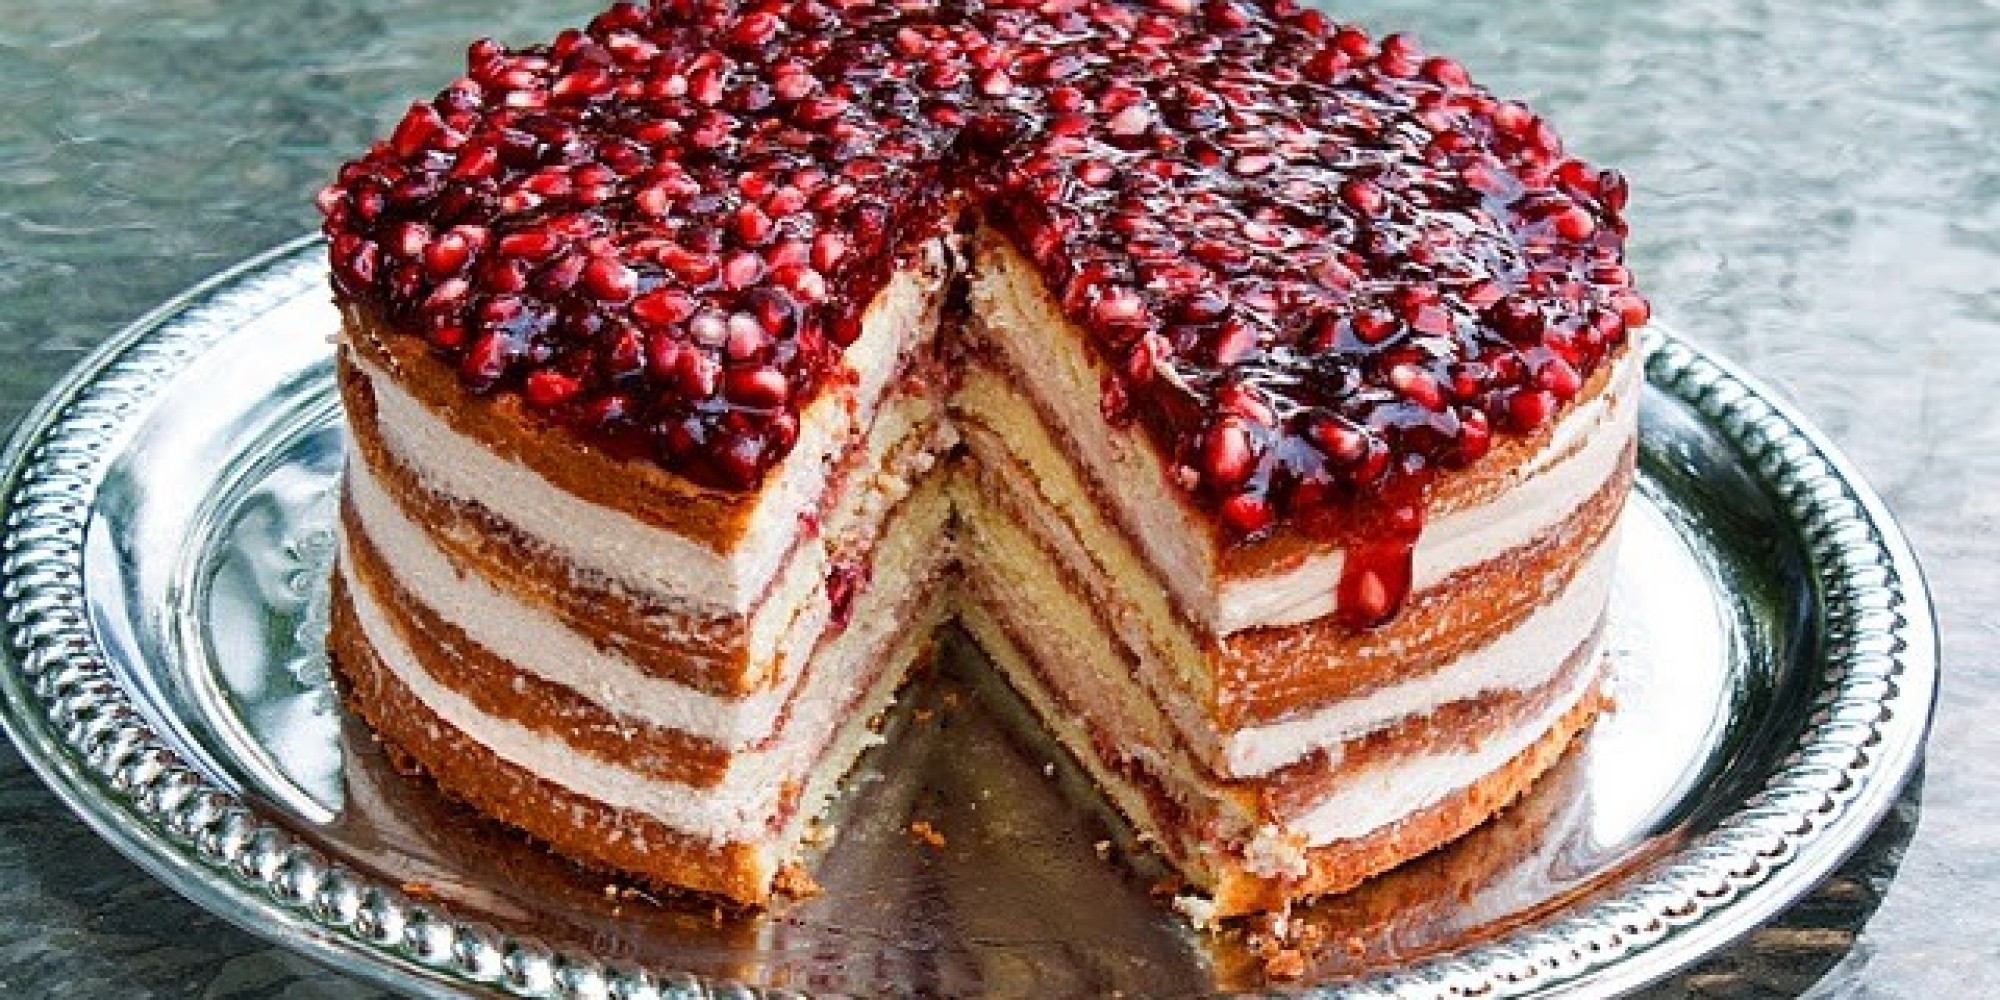 Best Christmas Cake Recipe Ever  The Most Stunning Christmas Dessert Recipes Ever PHOTOS